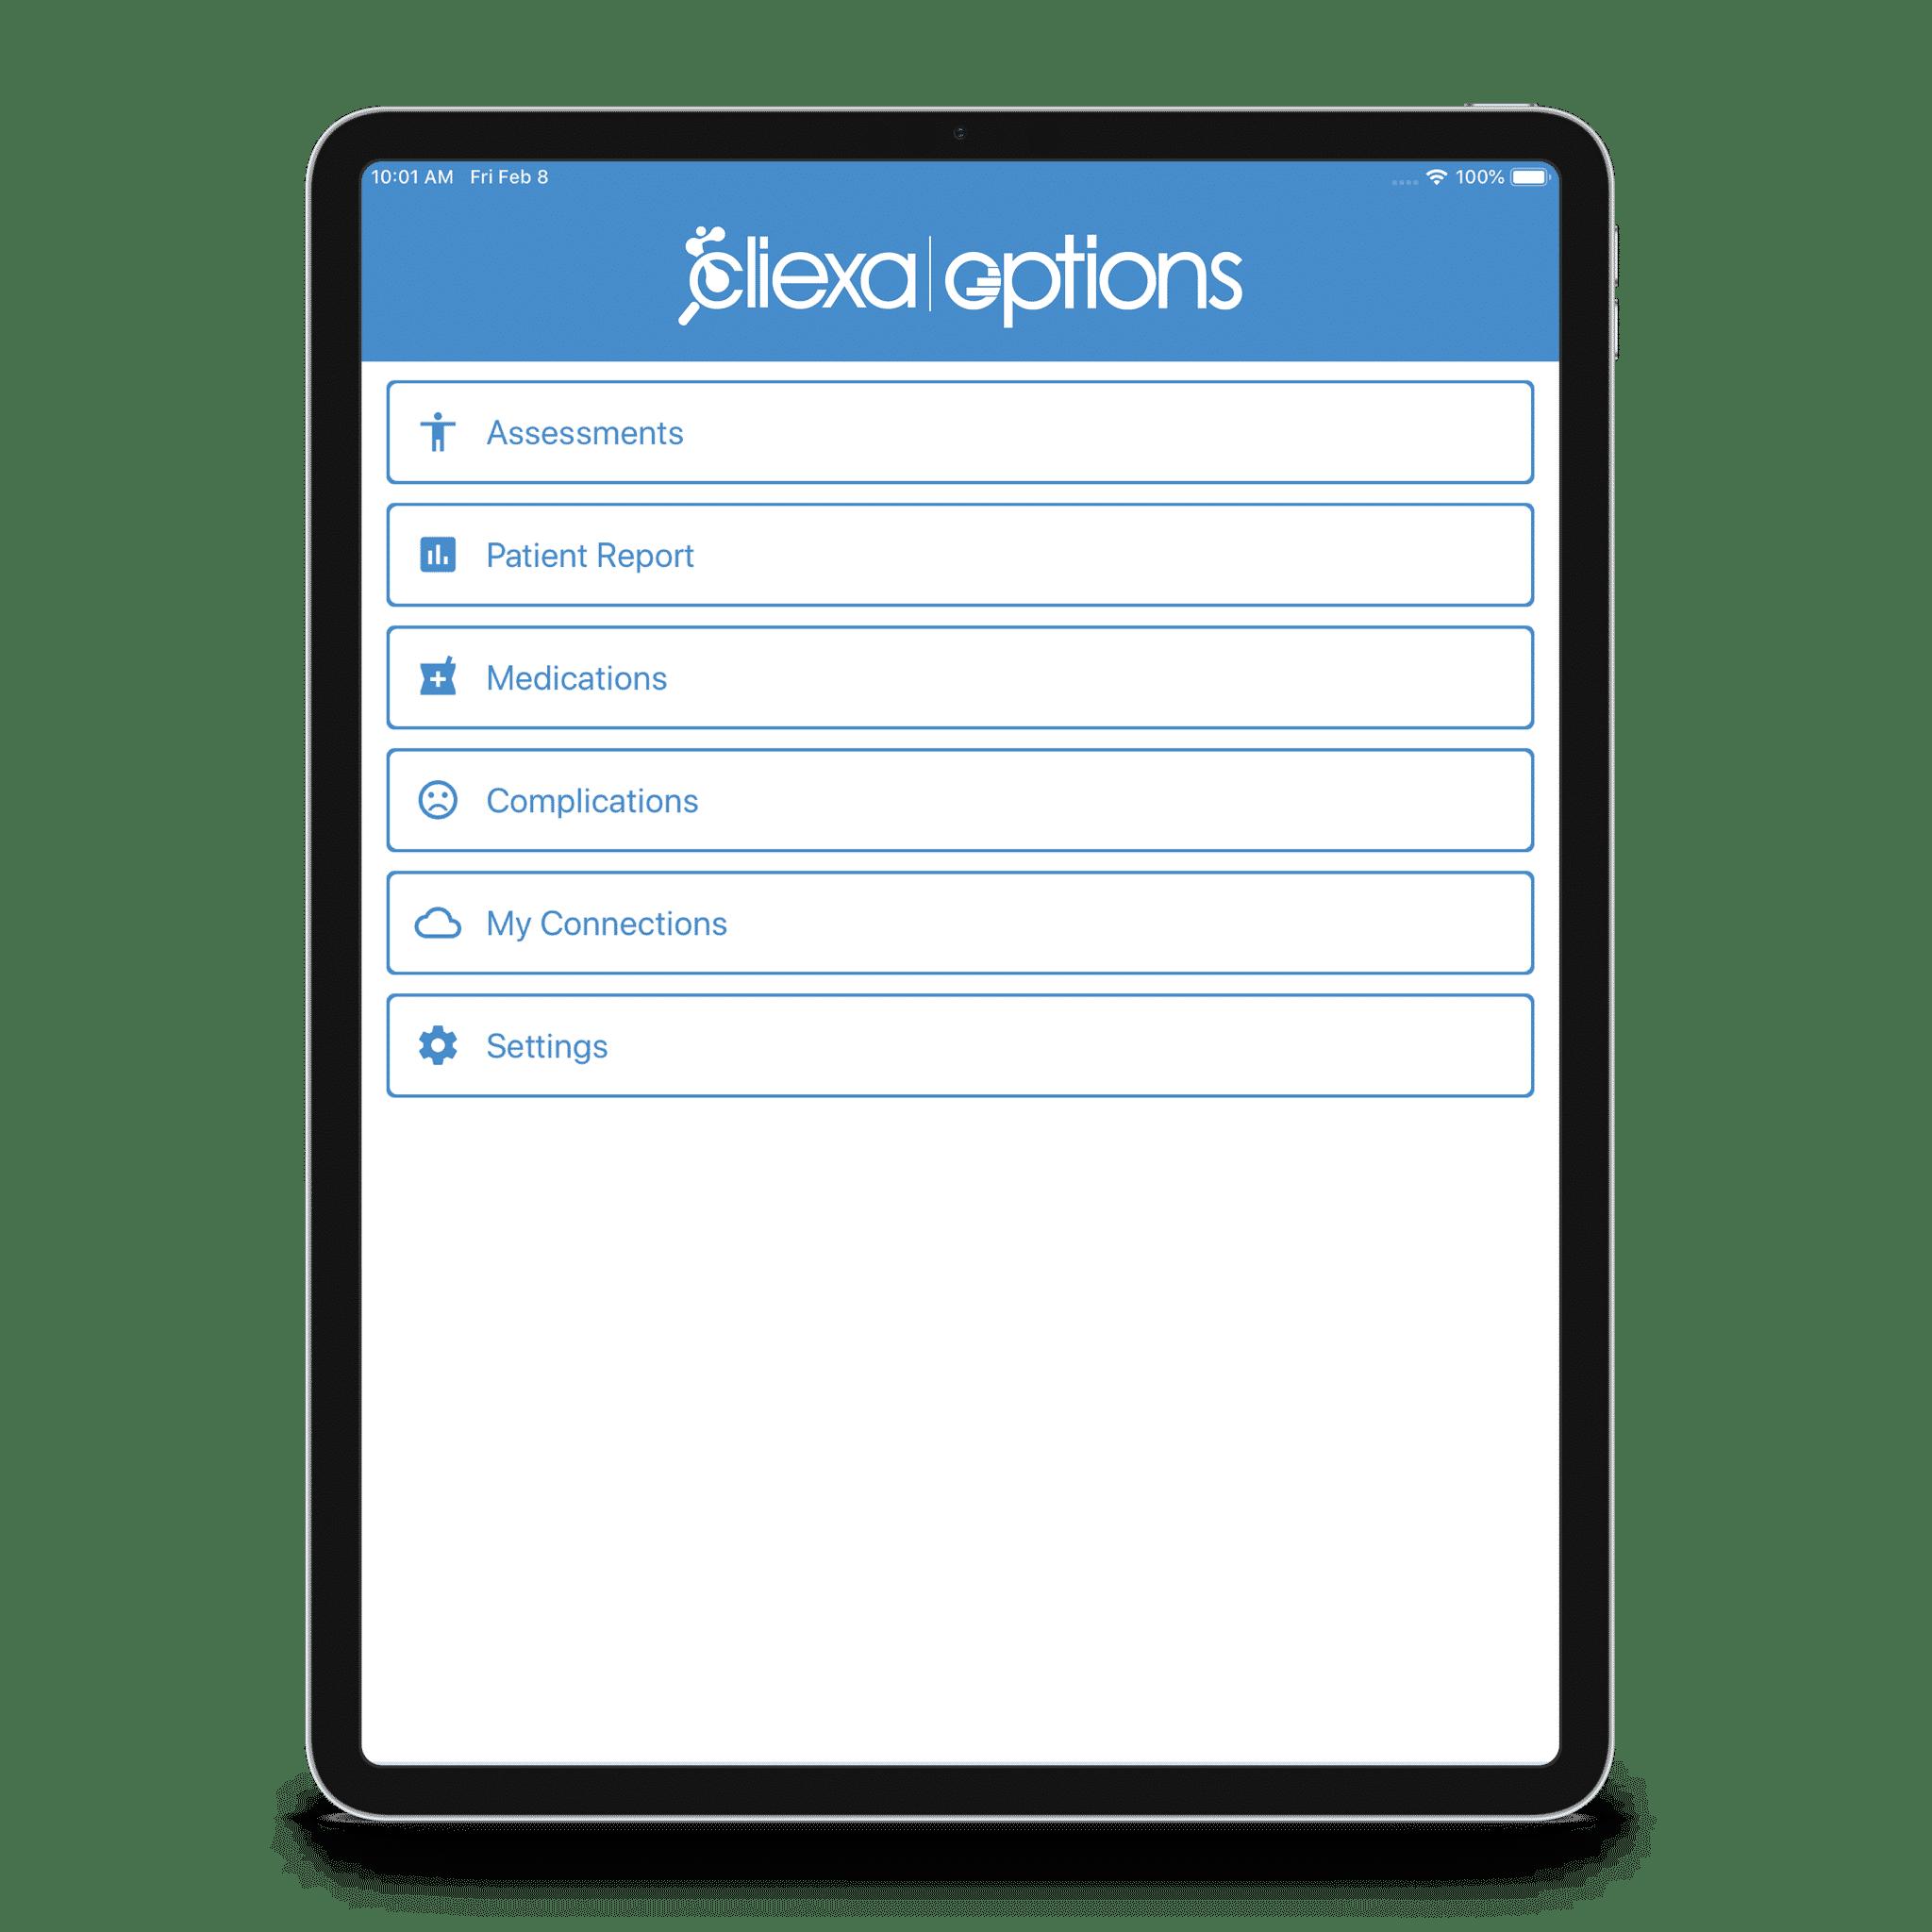 cliexa-OPTIONS iPad Mockup